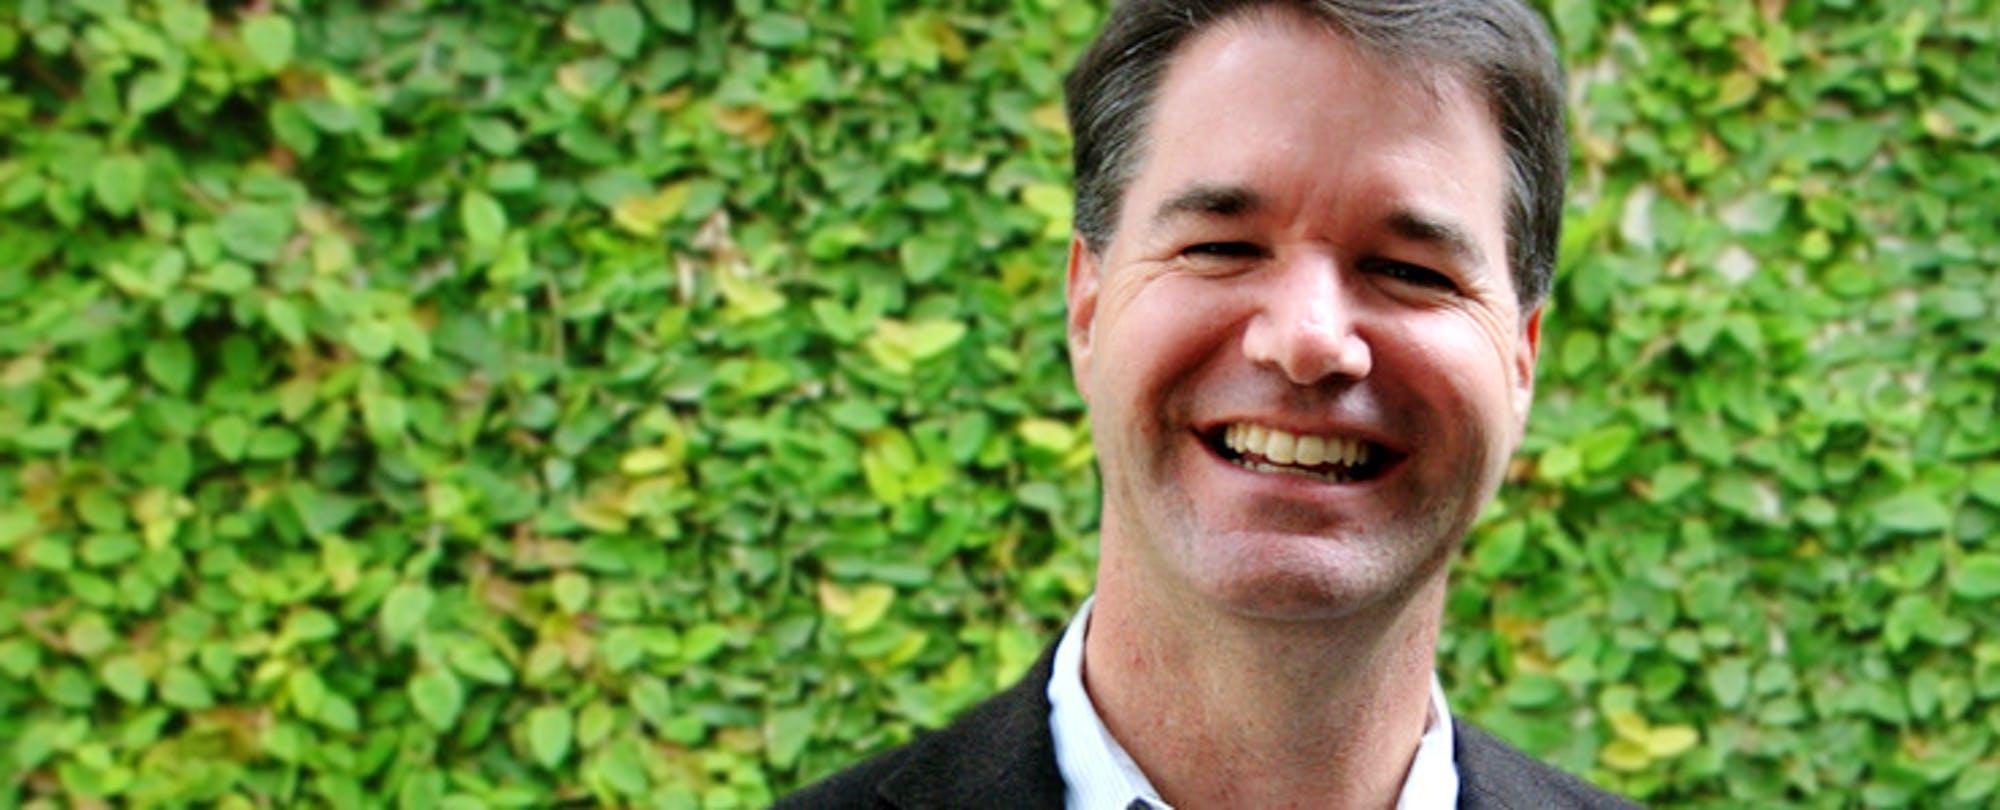 Q&A with Education Technology Entrepreneur John Danner